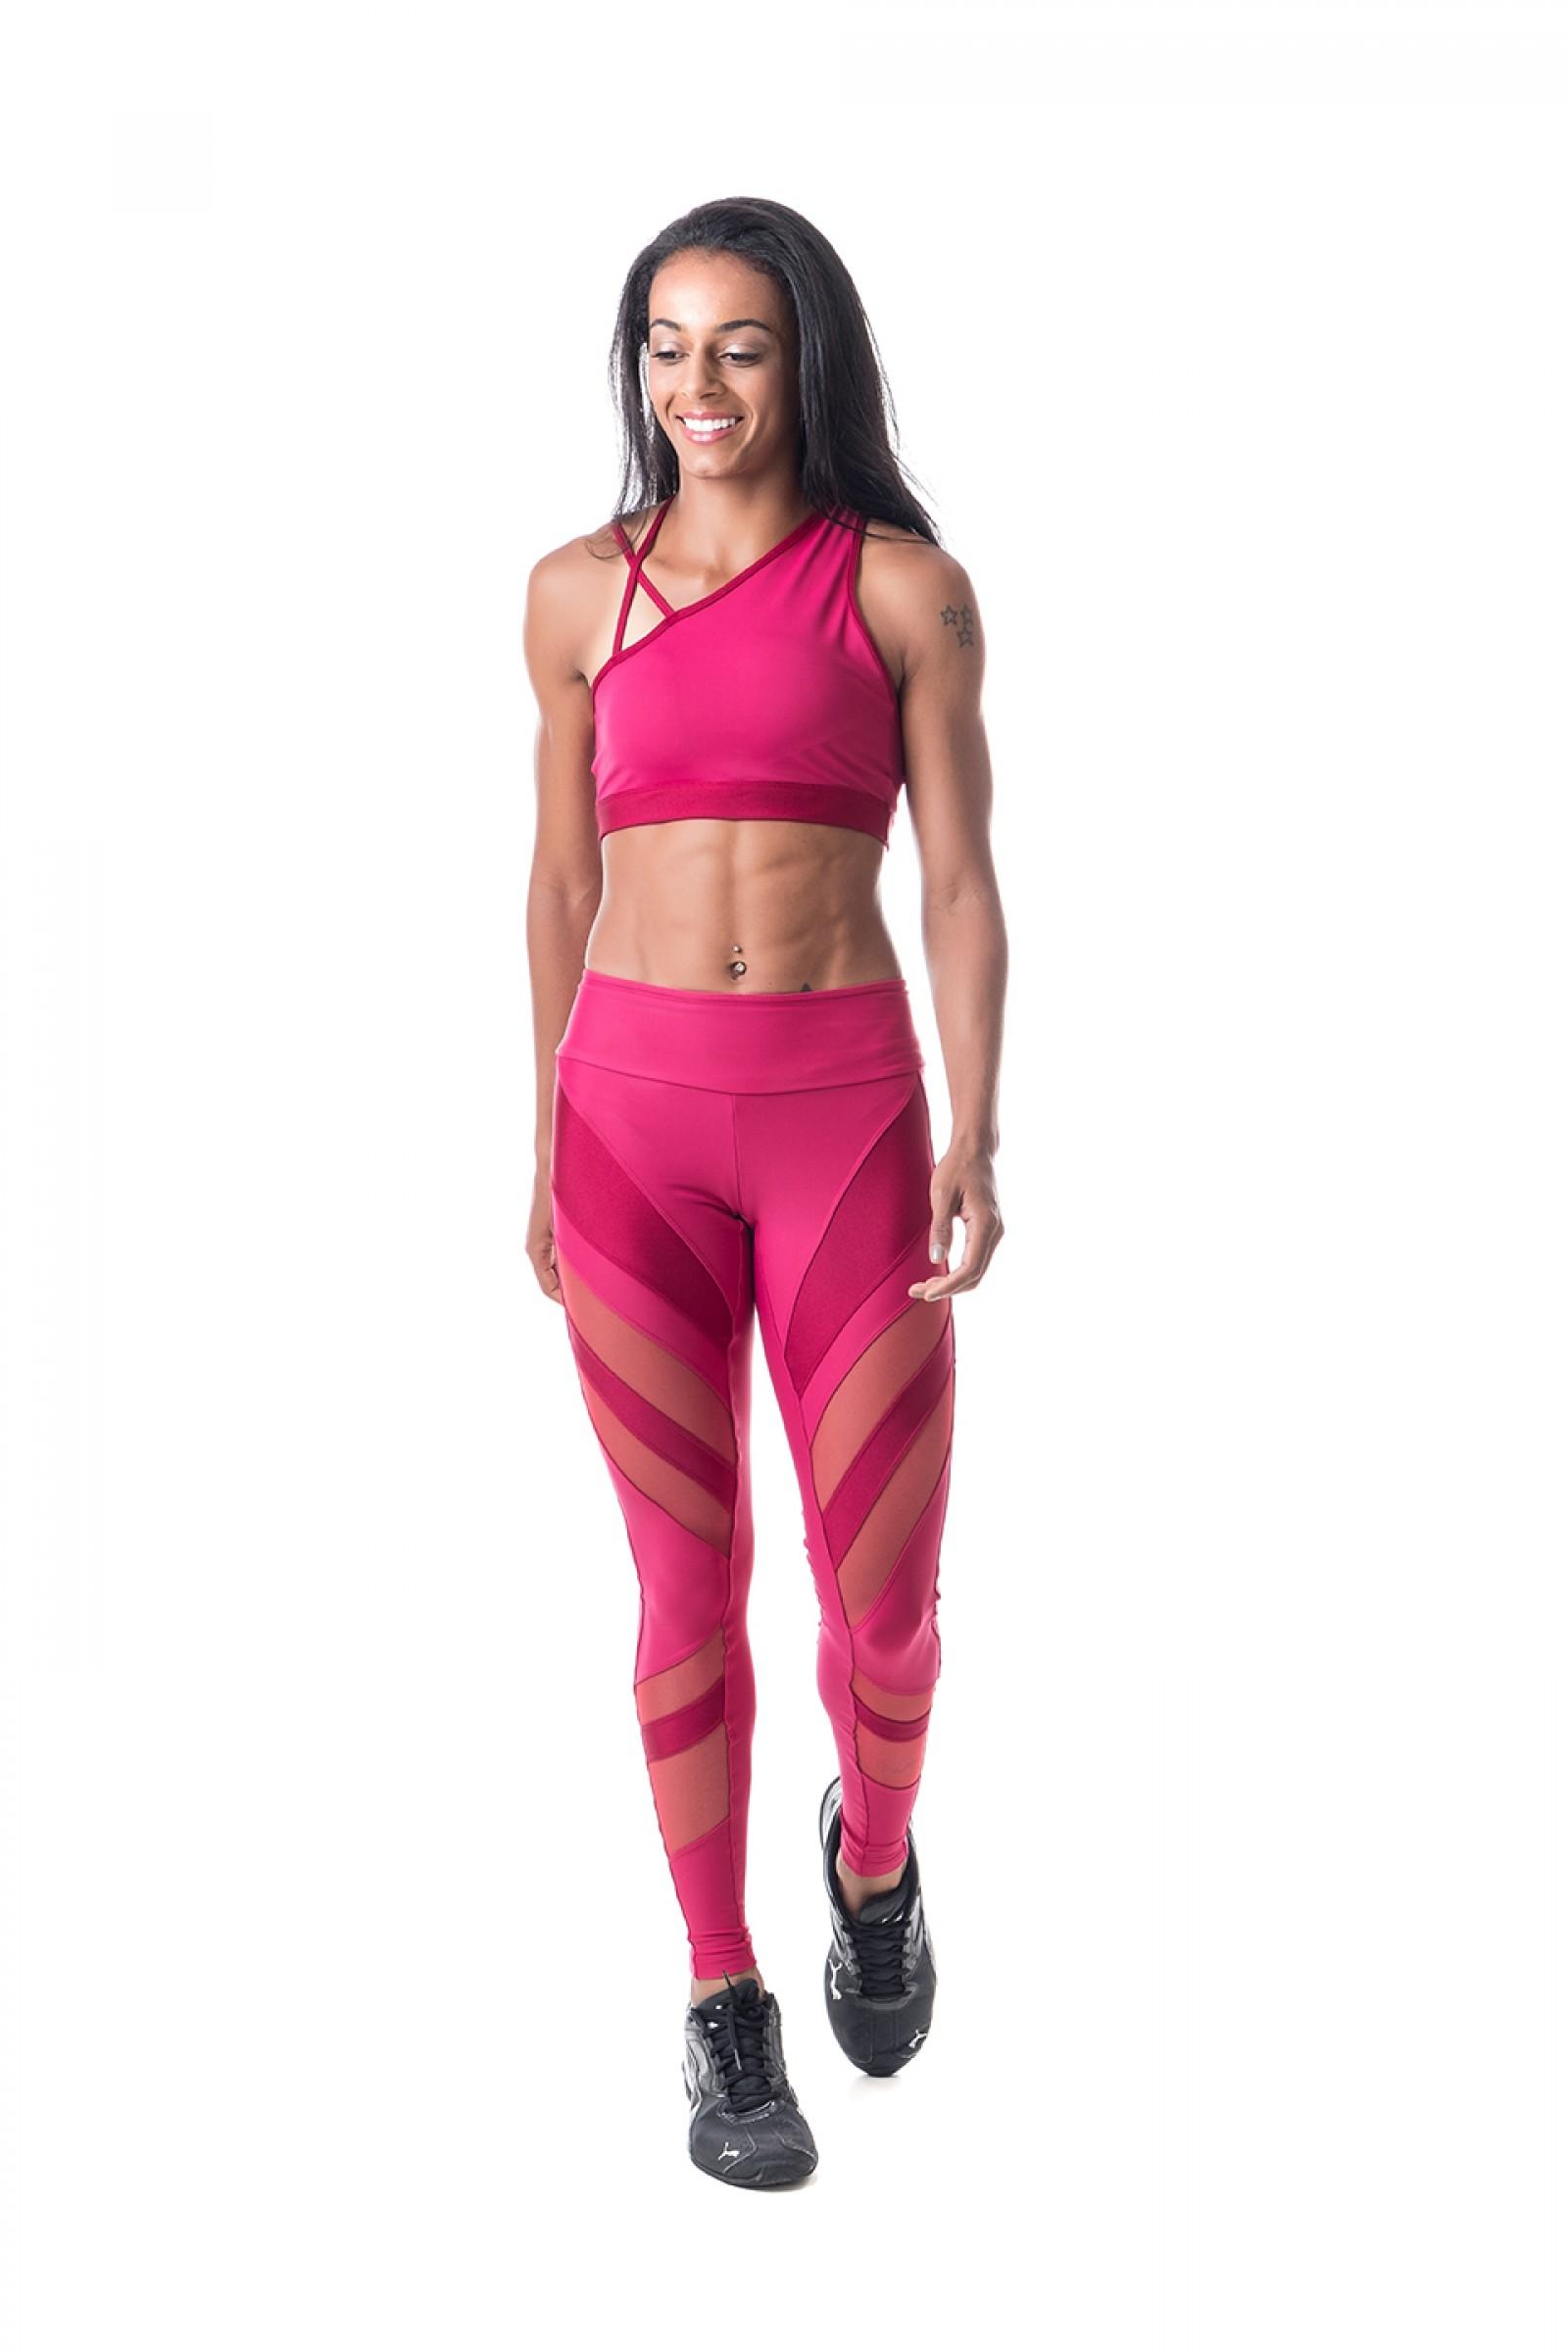 Legging Instigate Marsala, Coleção Challenge - NKT Fitwear Moda Fitness